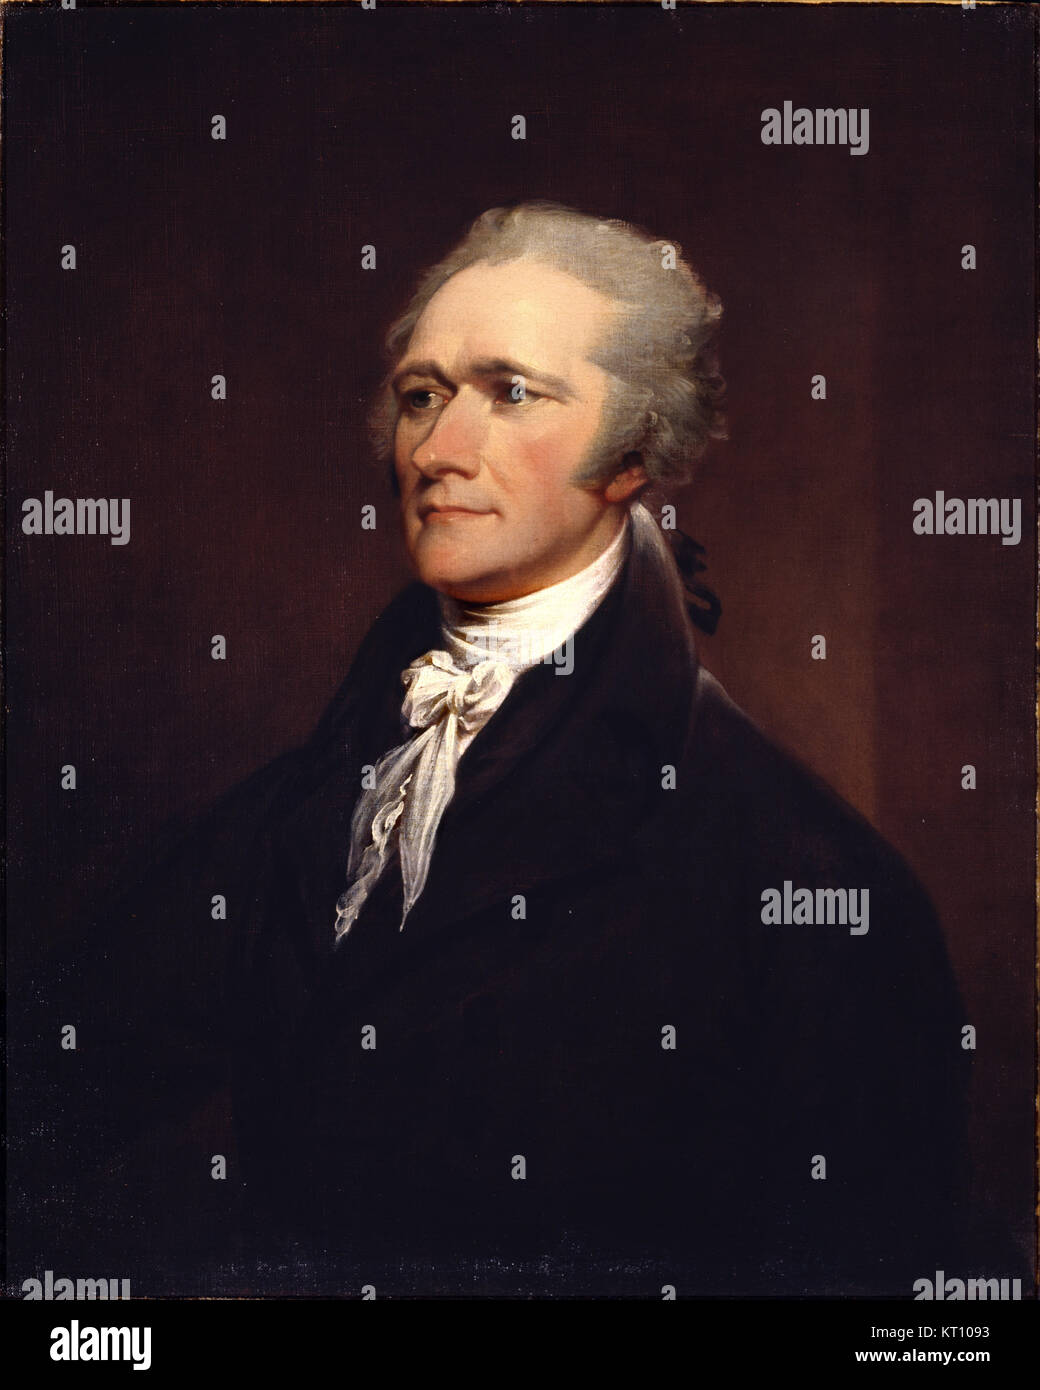 ALEXANDER HAMILTON (1755 or 1757-1804) American statesman in an posthumous 1806 portrait by John Trumbull - Stock Image